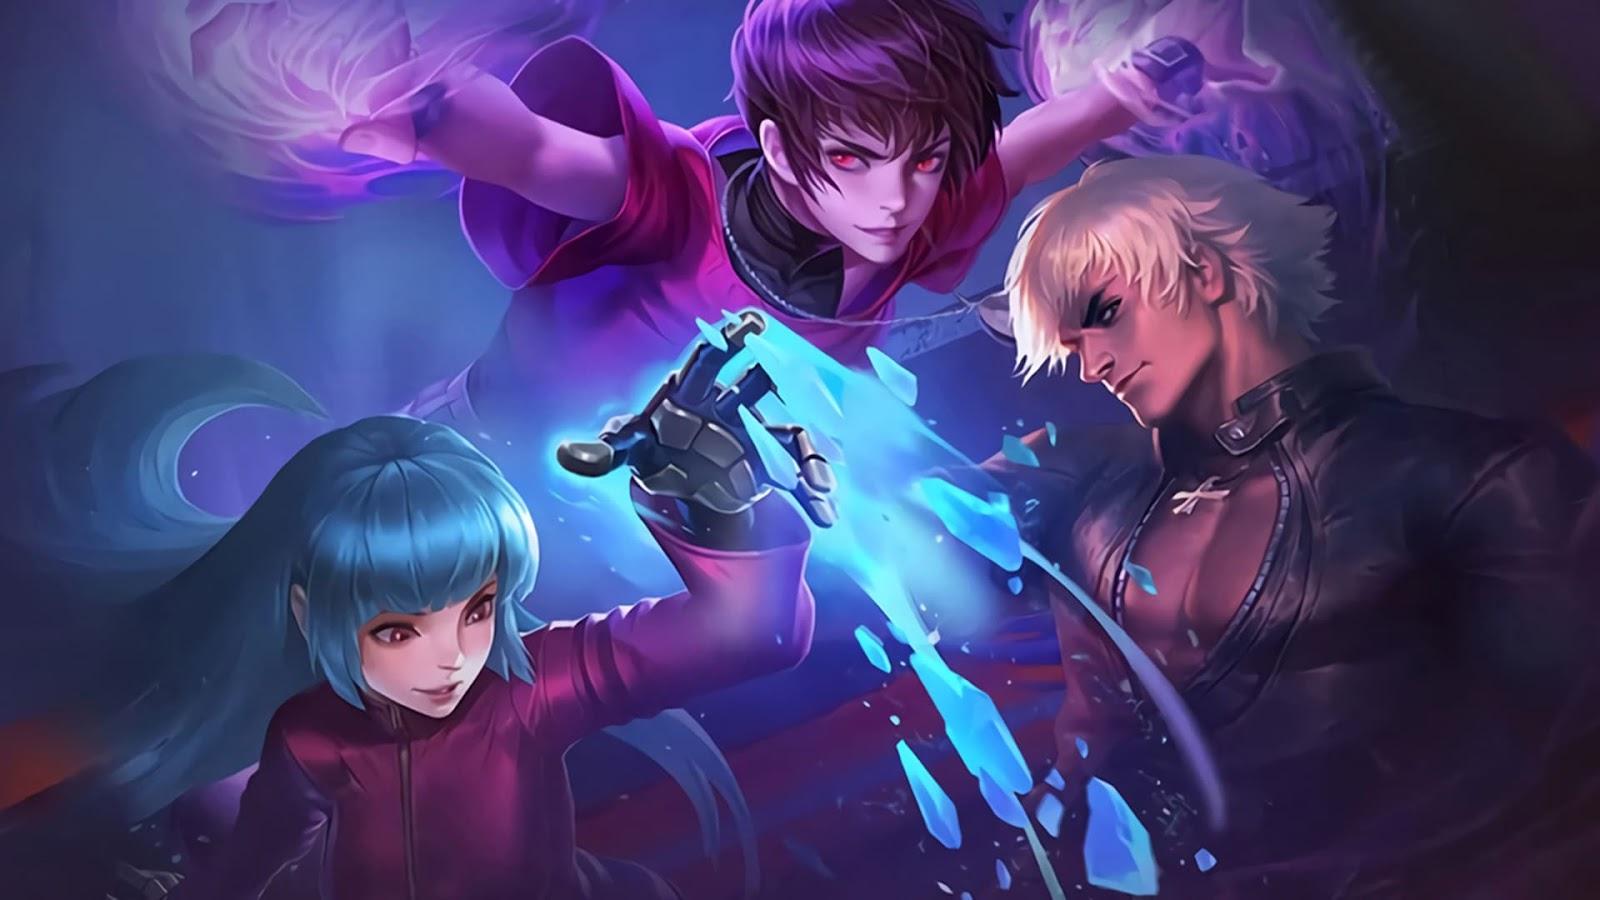 Wallpaper Dyrroth Orochi Chris, Aurora Kula Diamond, Gusion K'KOF Mobile Legends Skin HD for PC